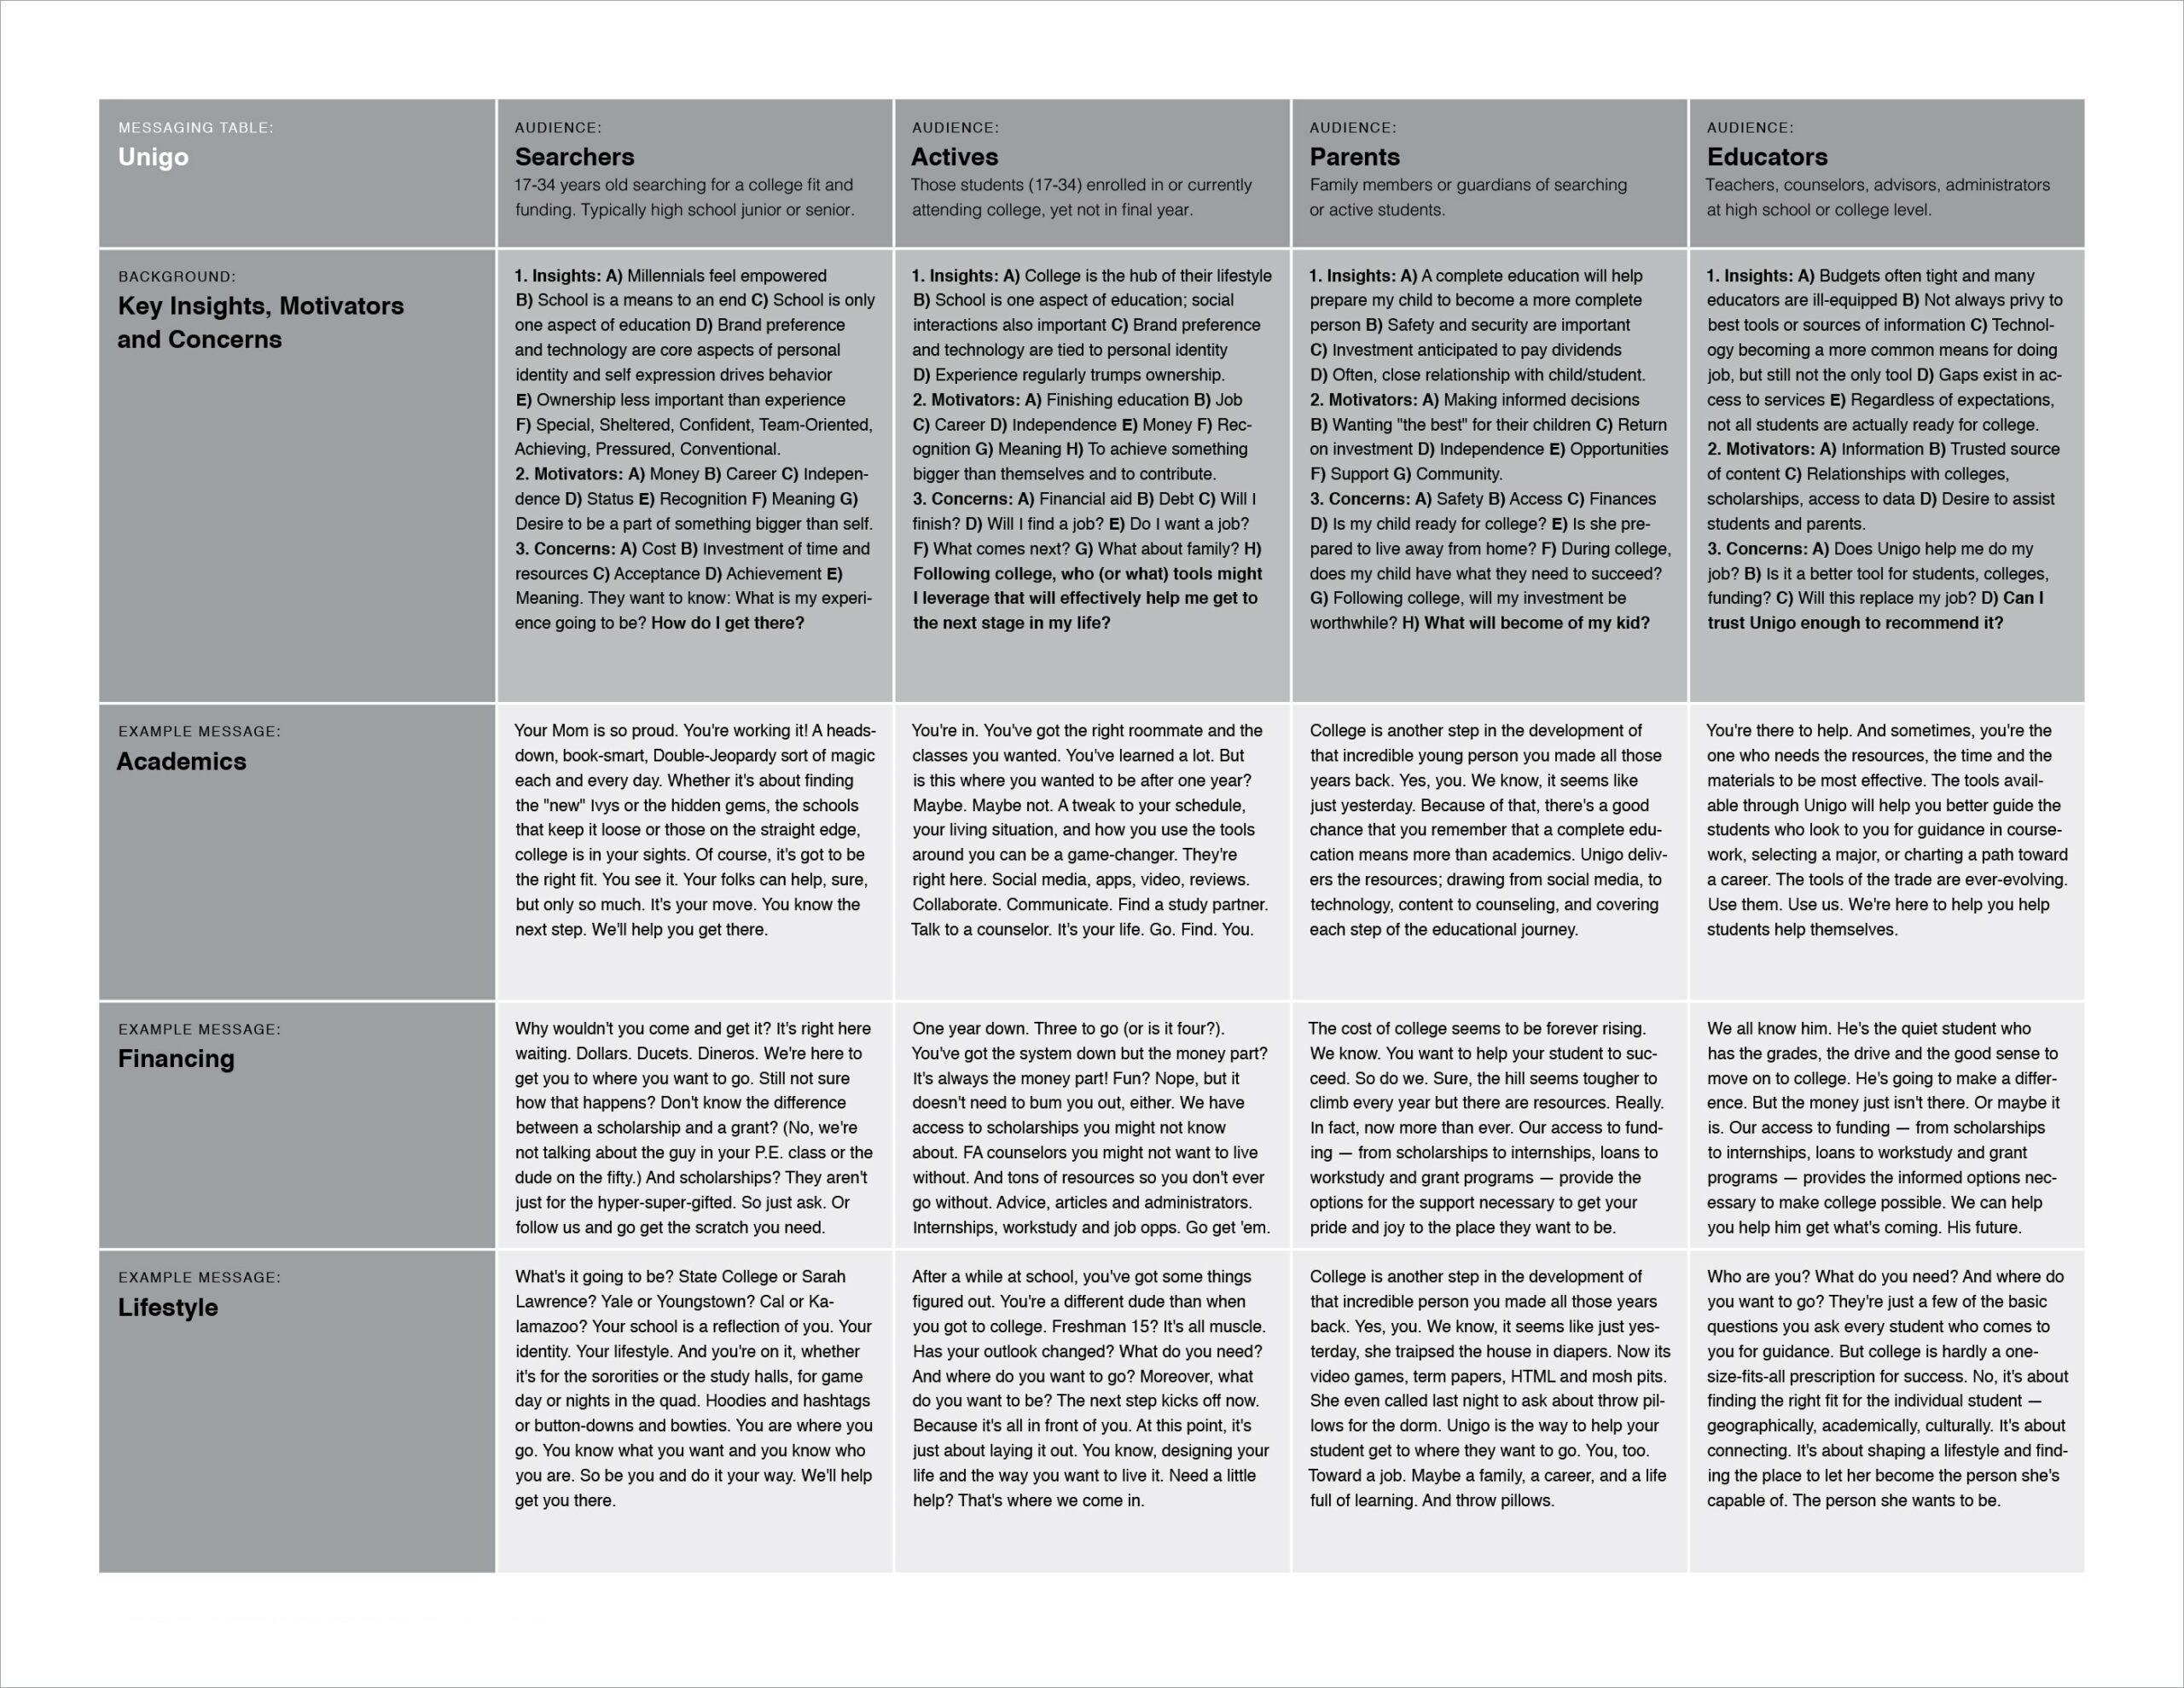 Unigo Messaging Matrix